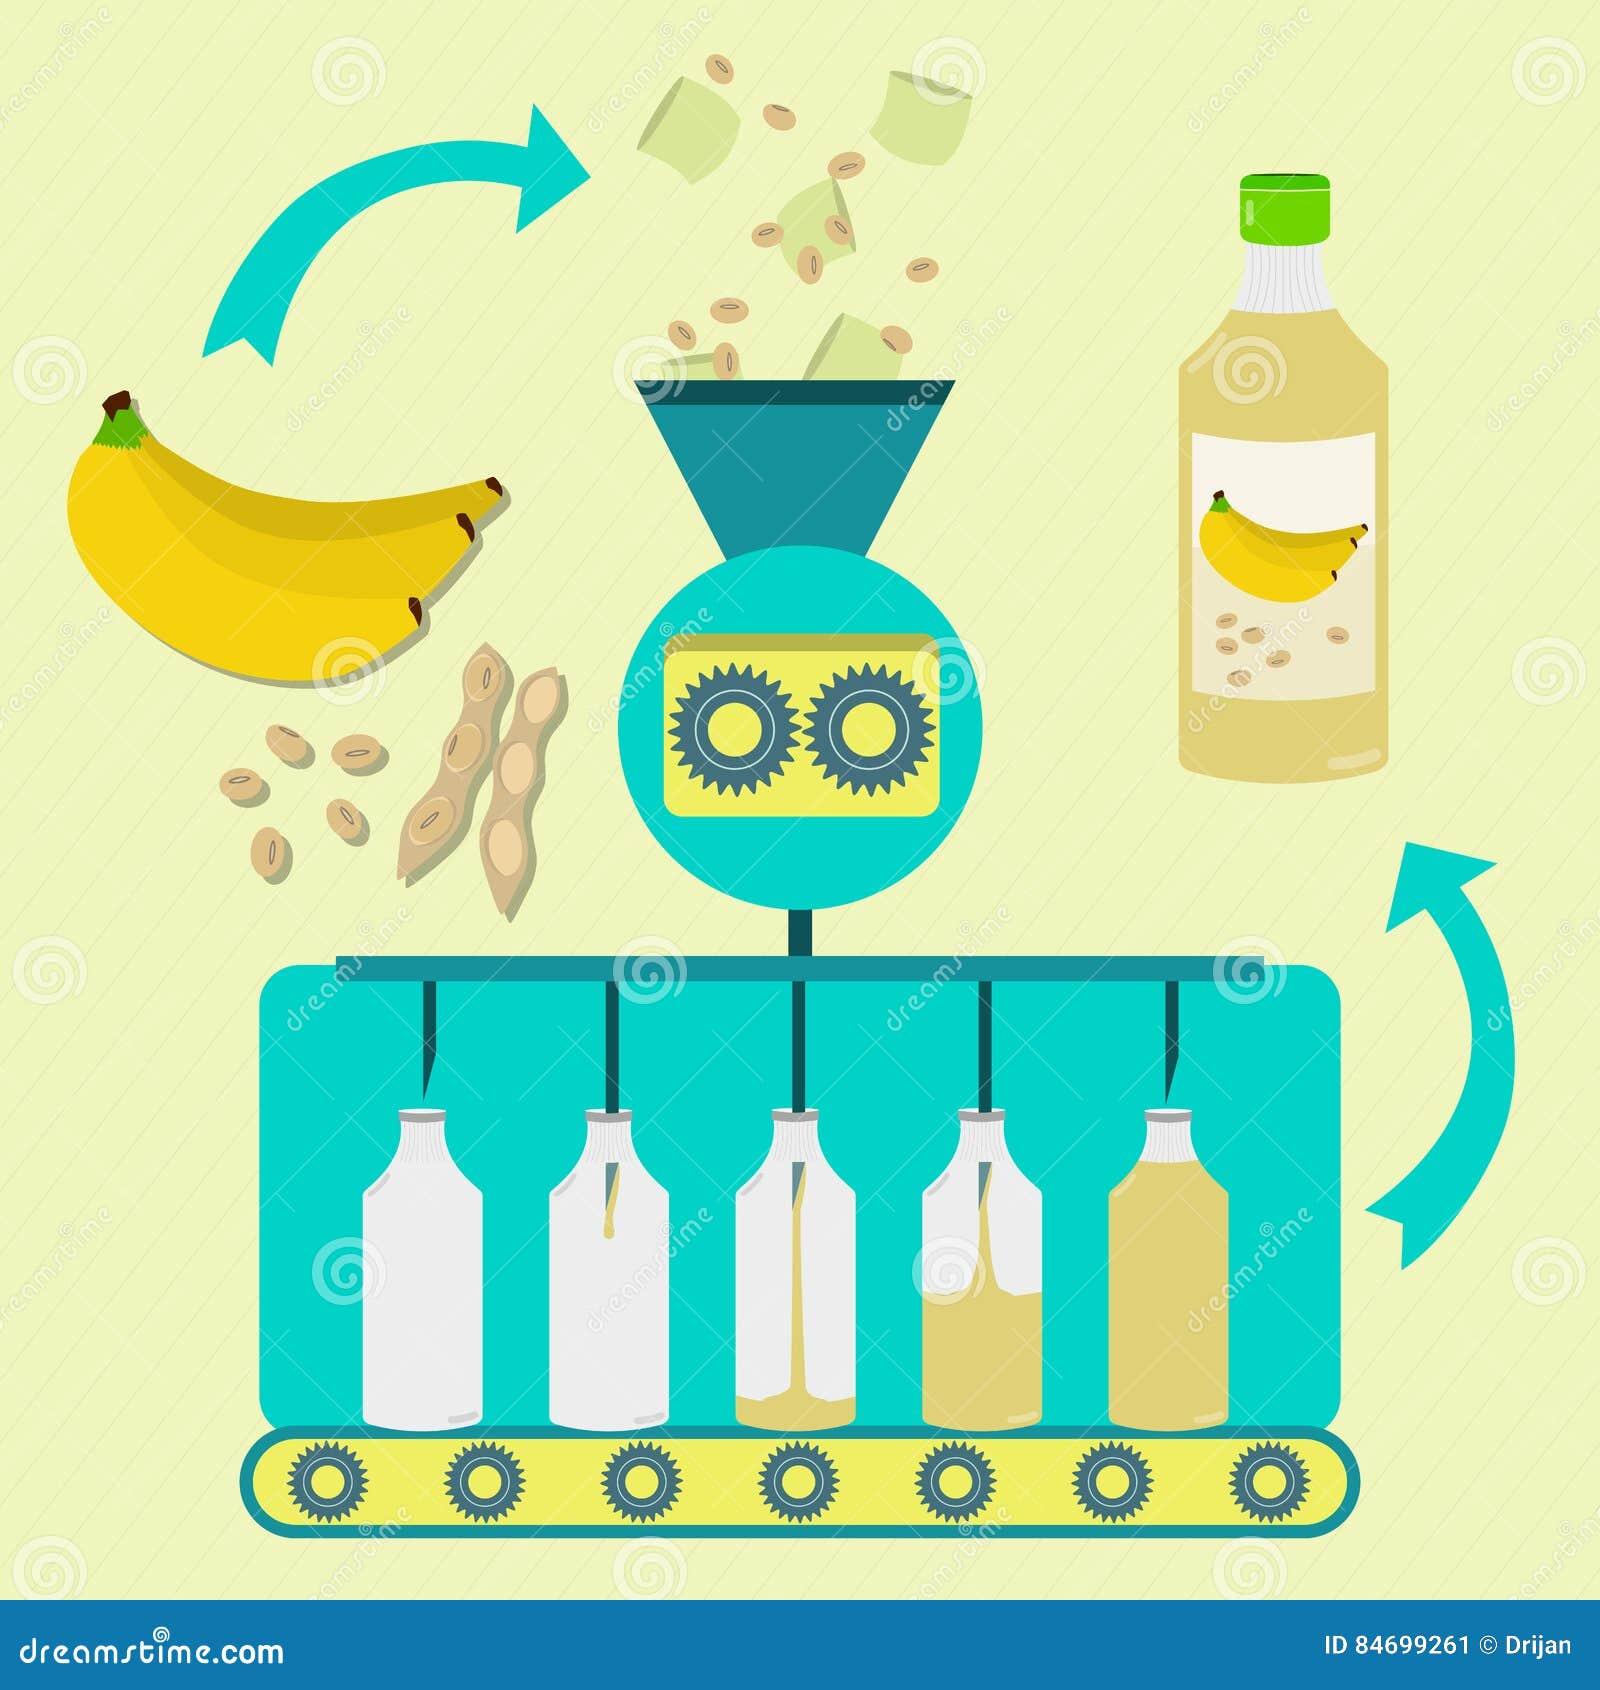 Processus de fabrication de jus de banane et de soja